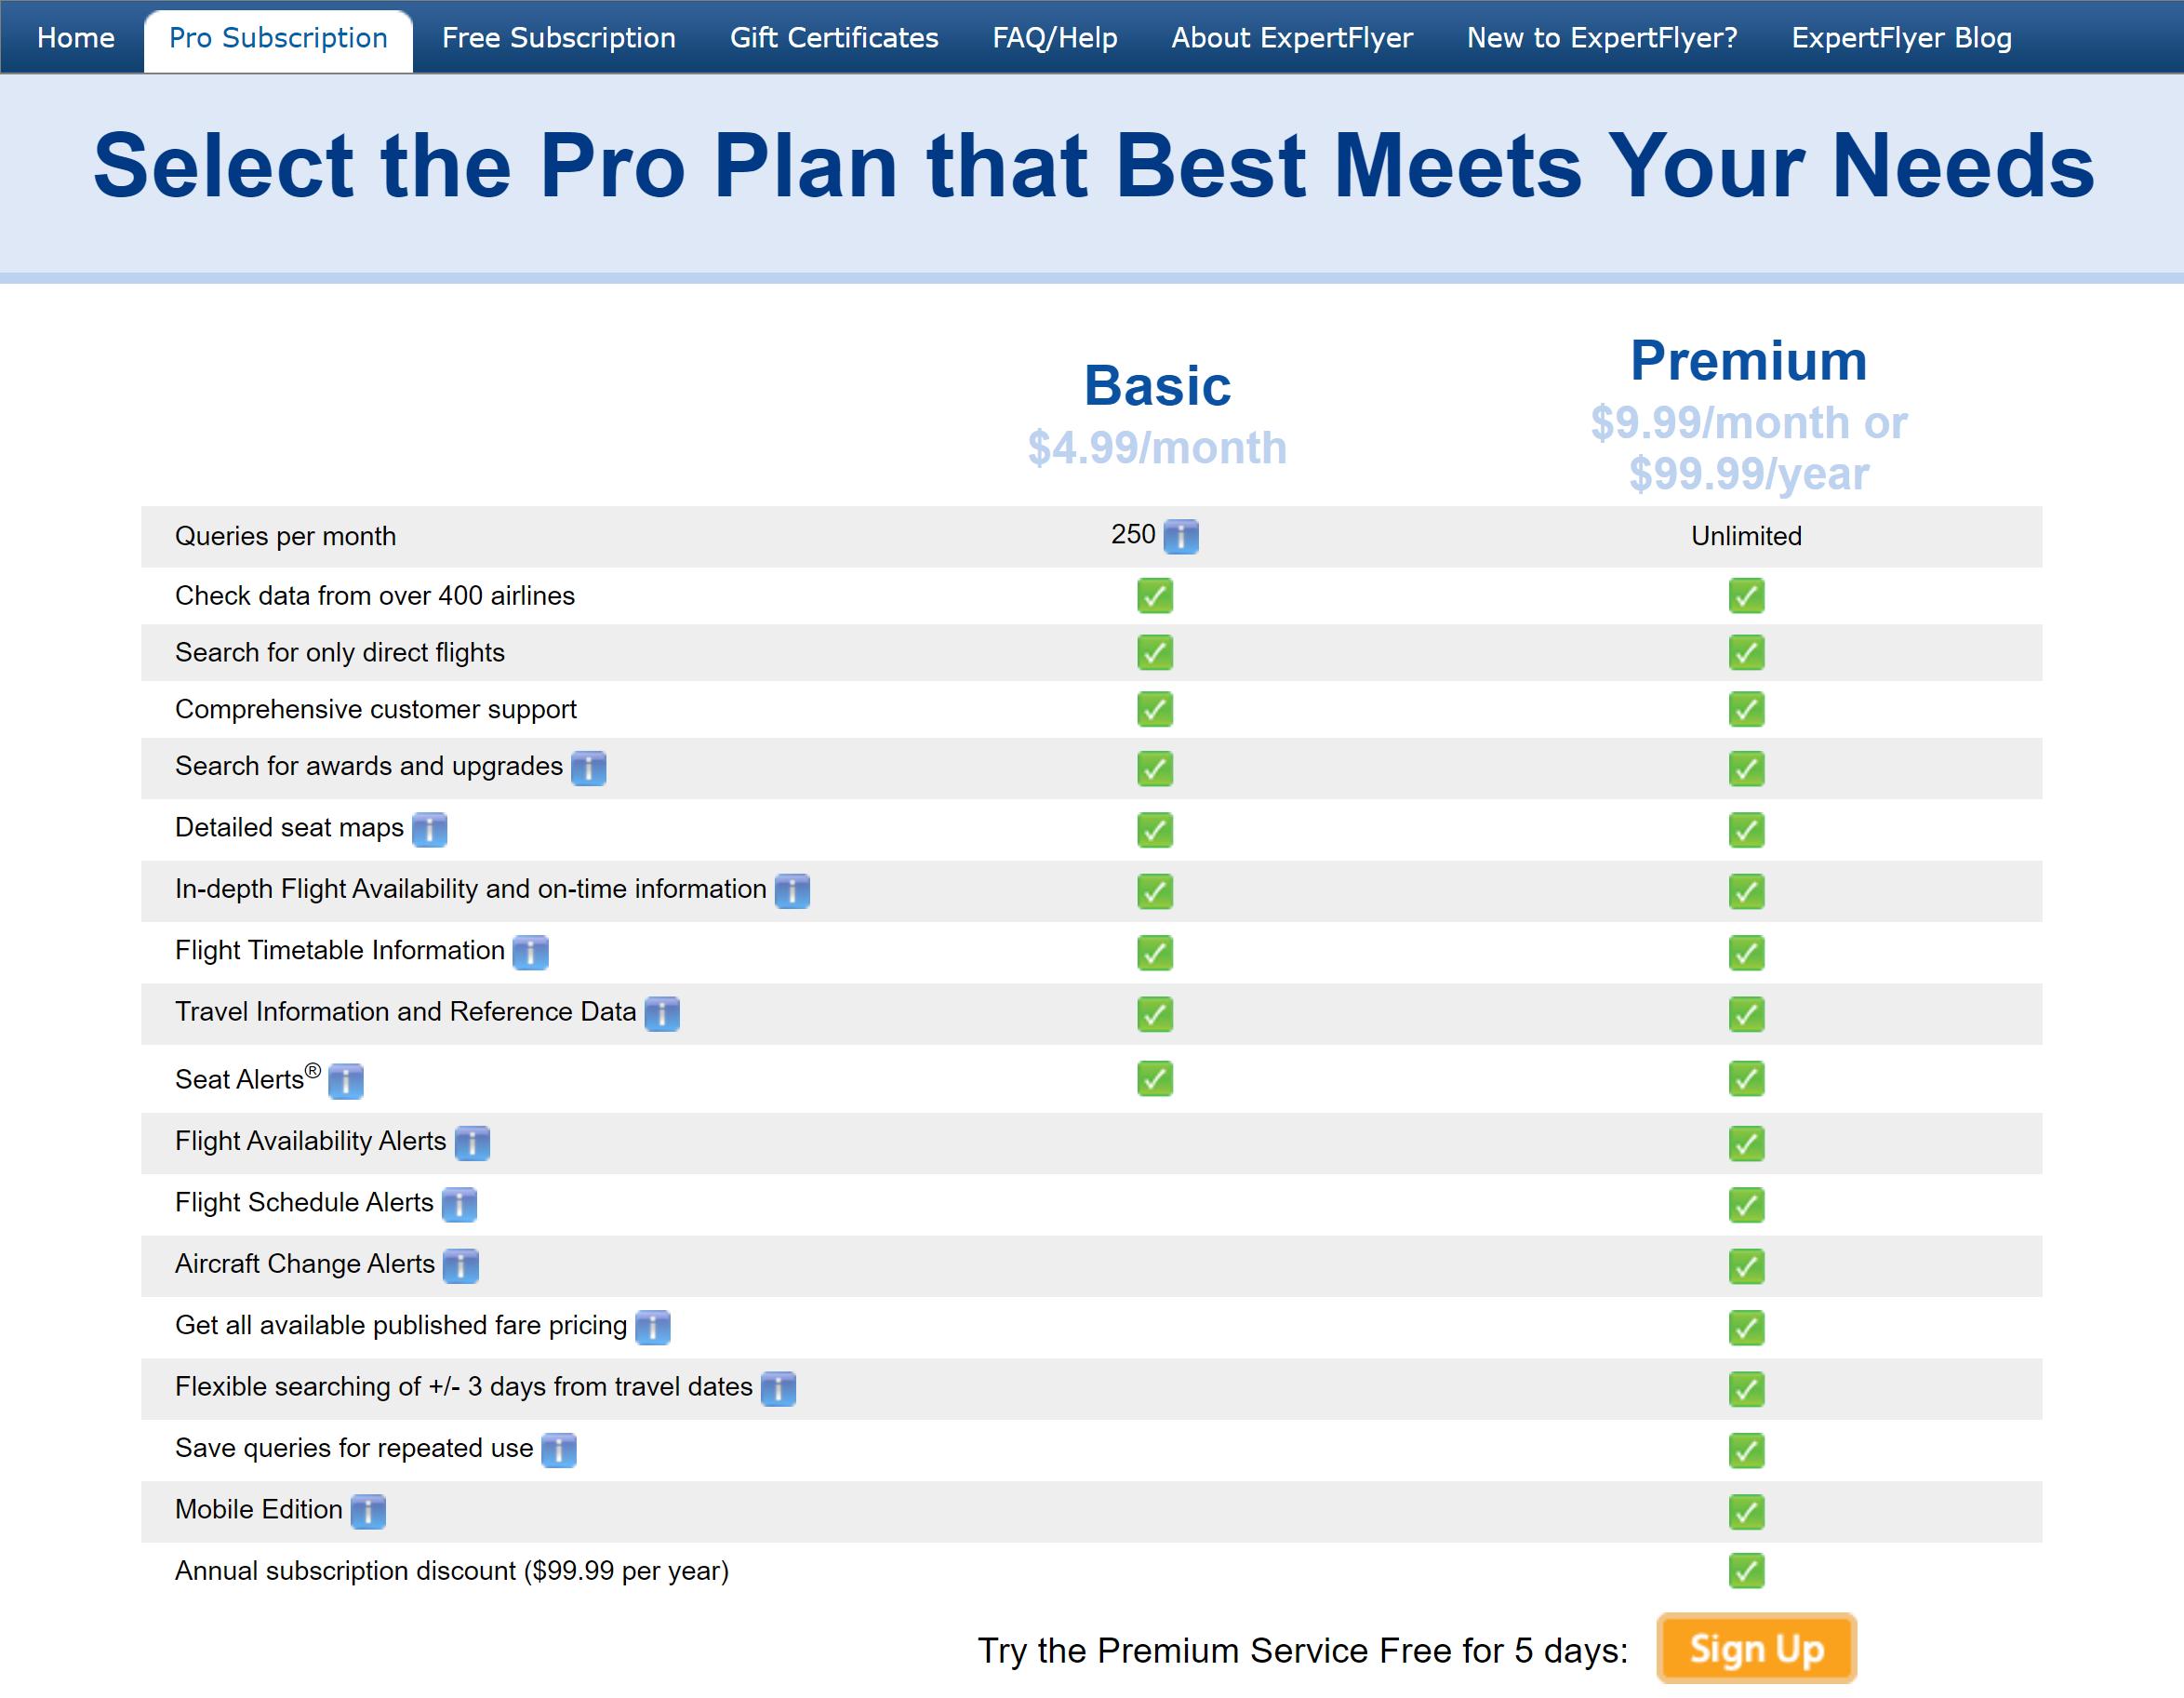 Basic vs. Premium